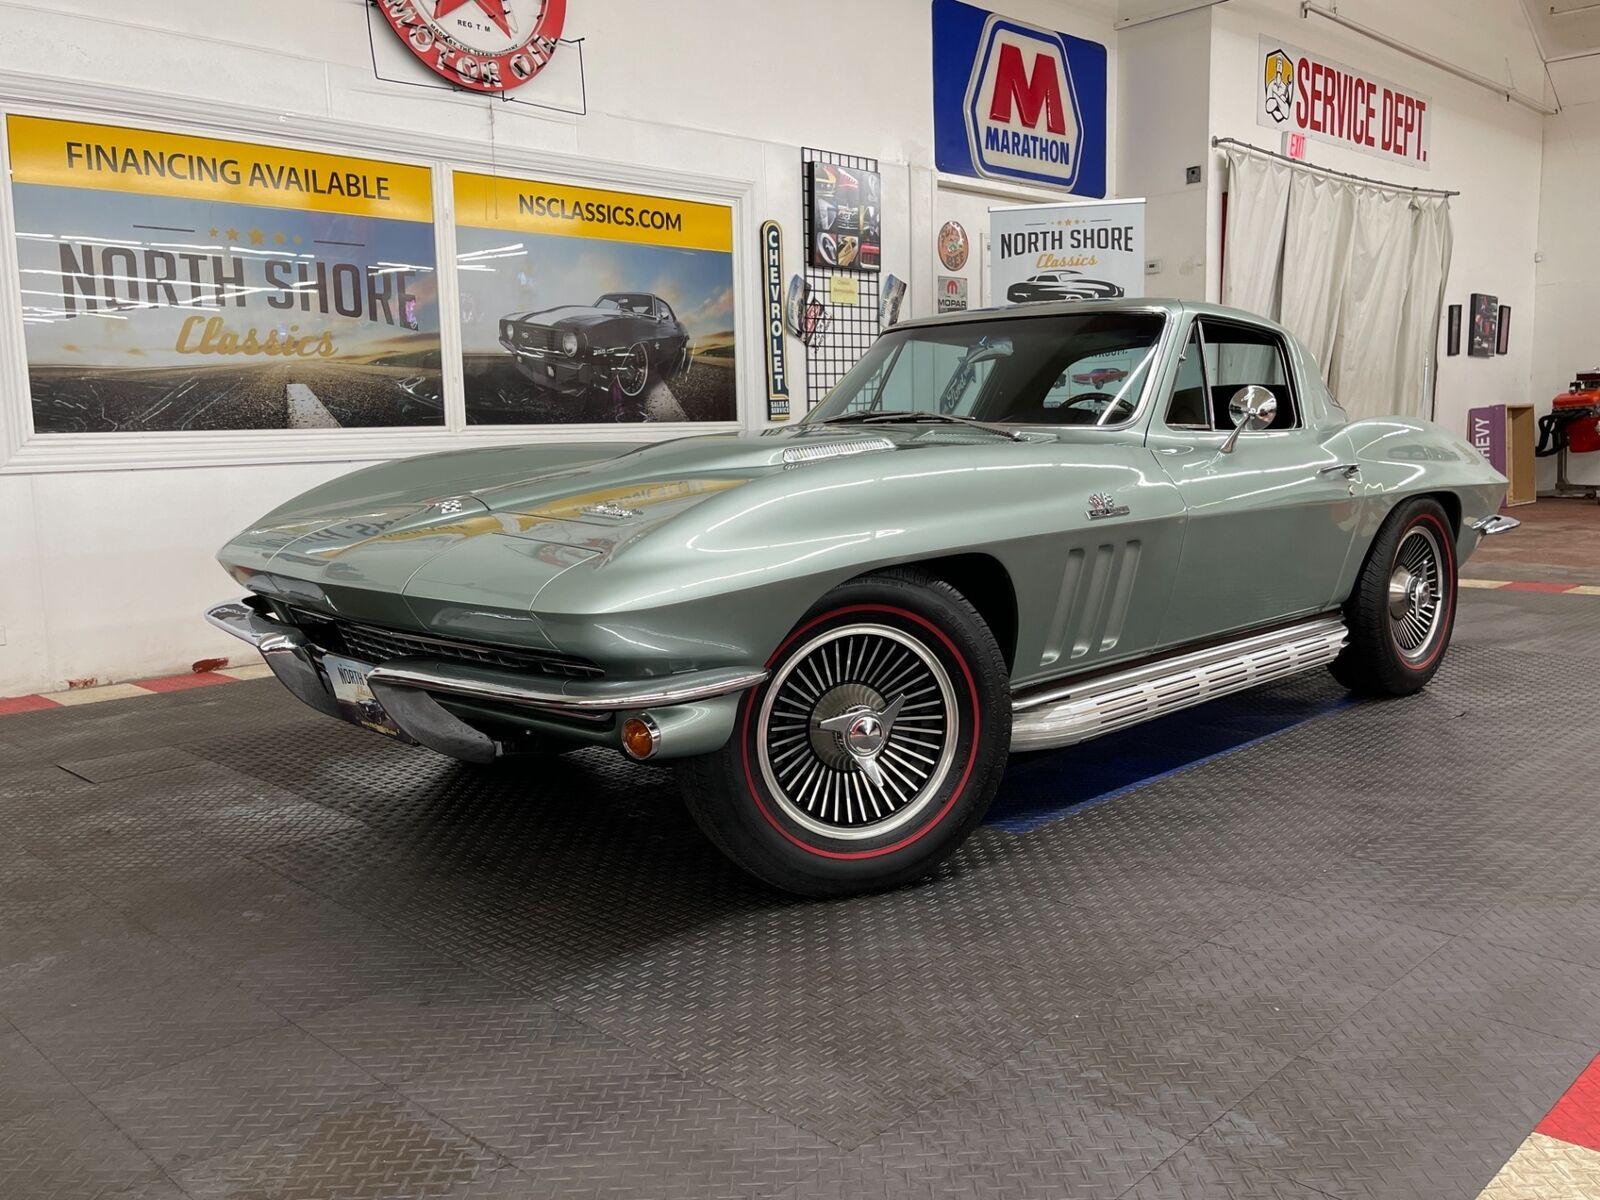 1966 Green Chevrolet Corvette Coupe  | C2 Corvette Photo 2